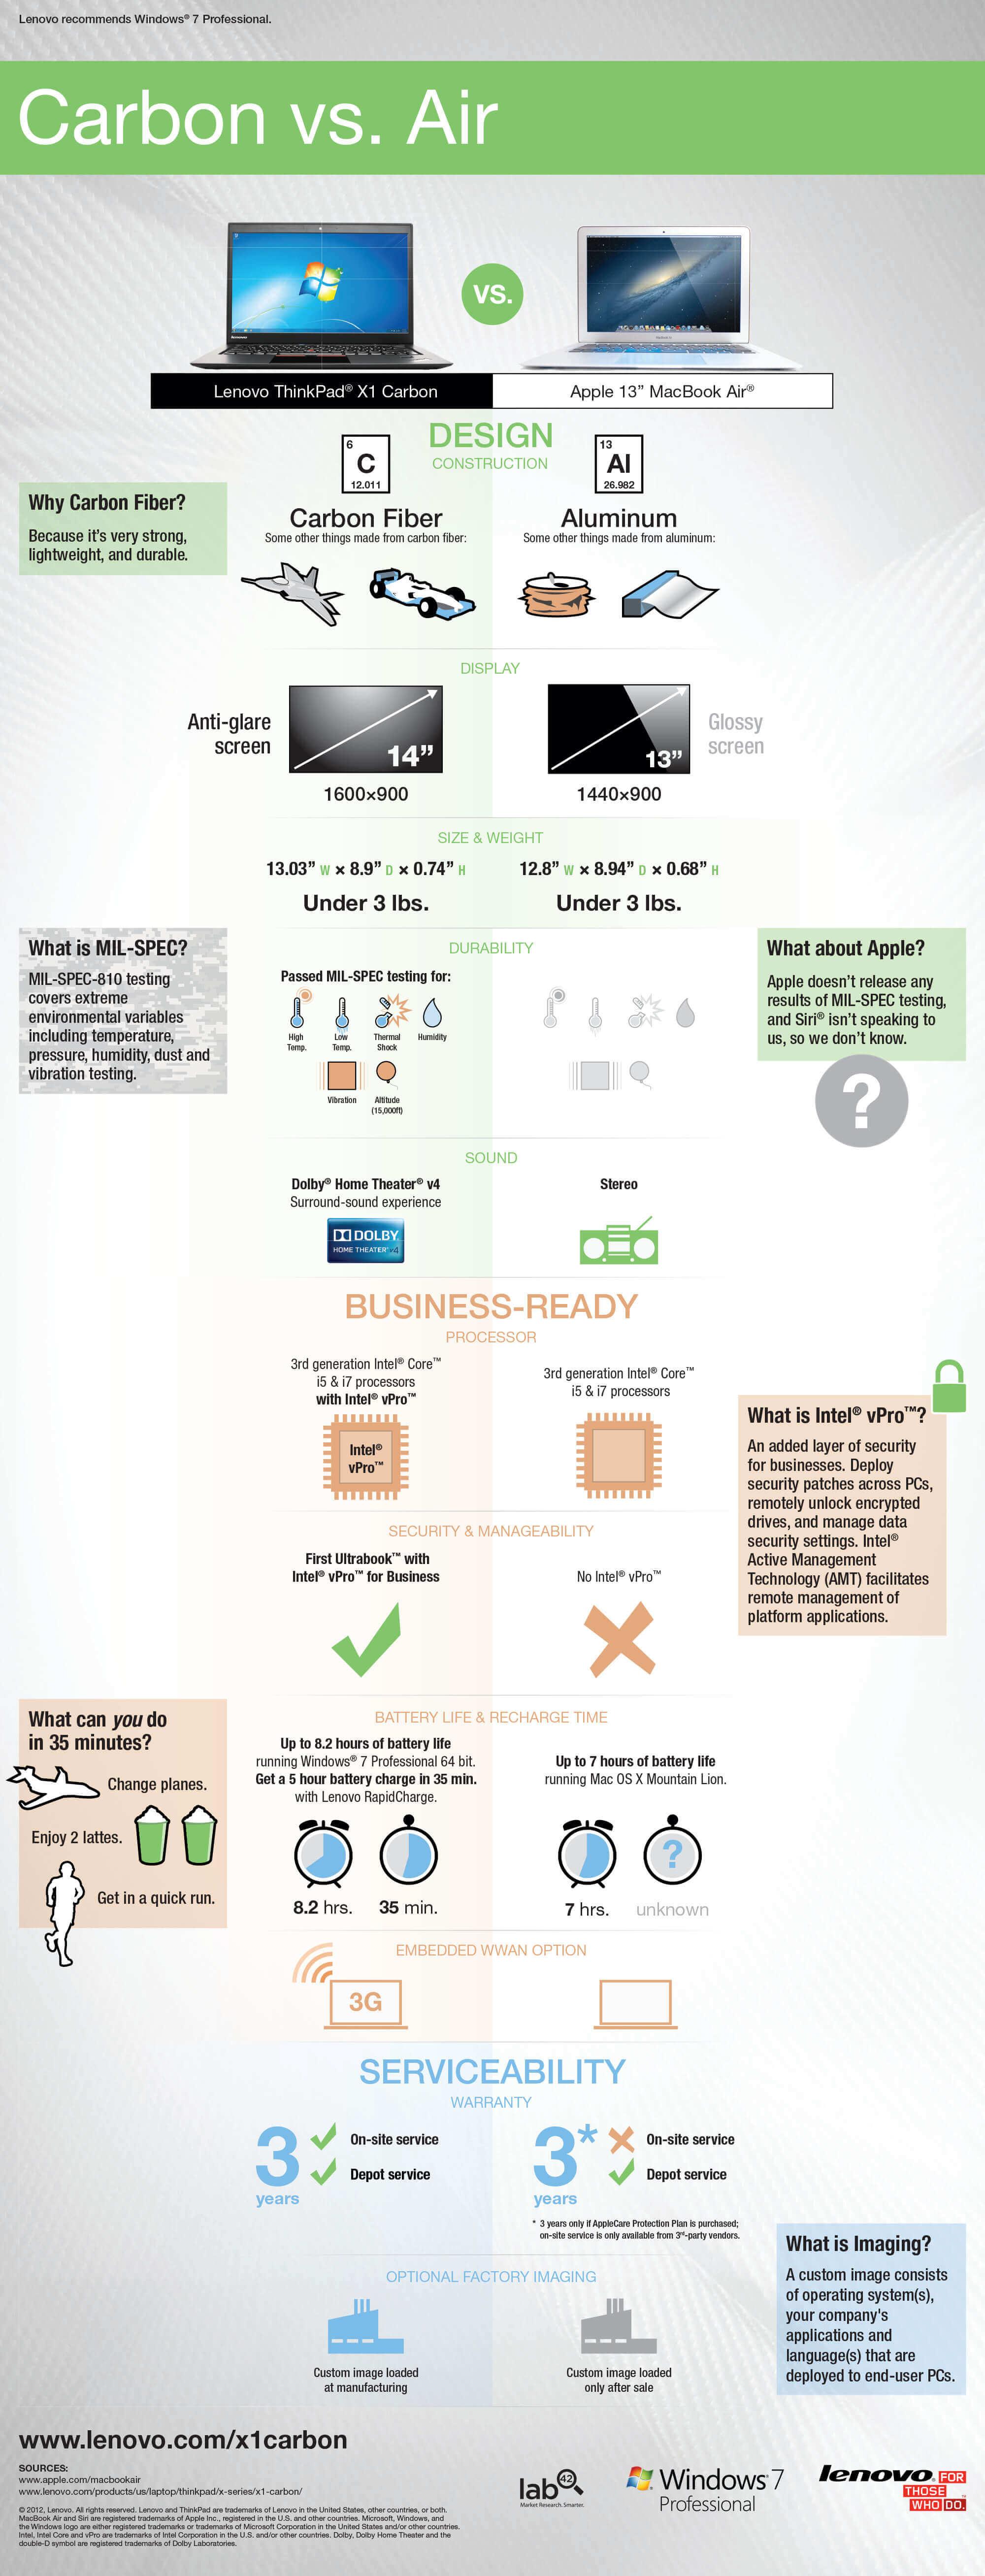 """Carbon vs. Air"" infographic"